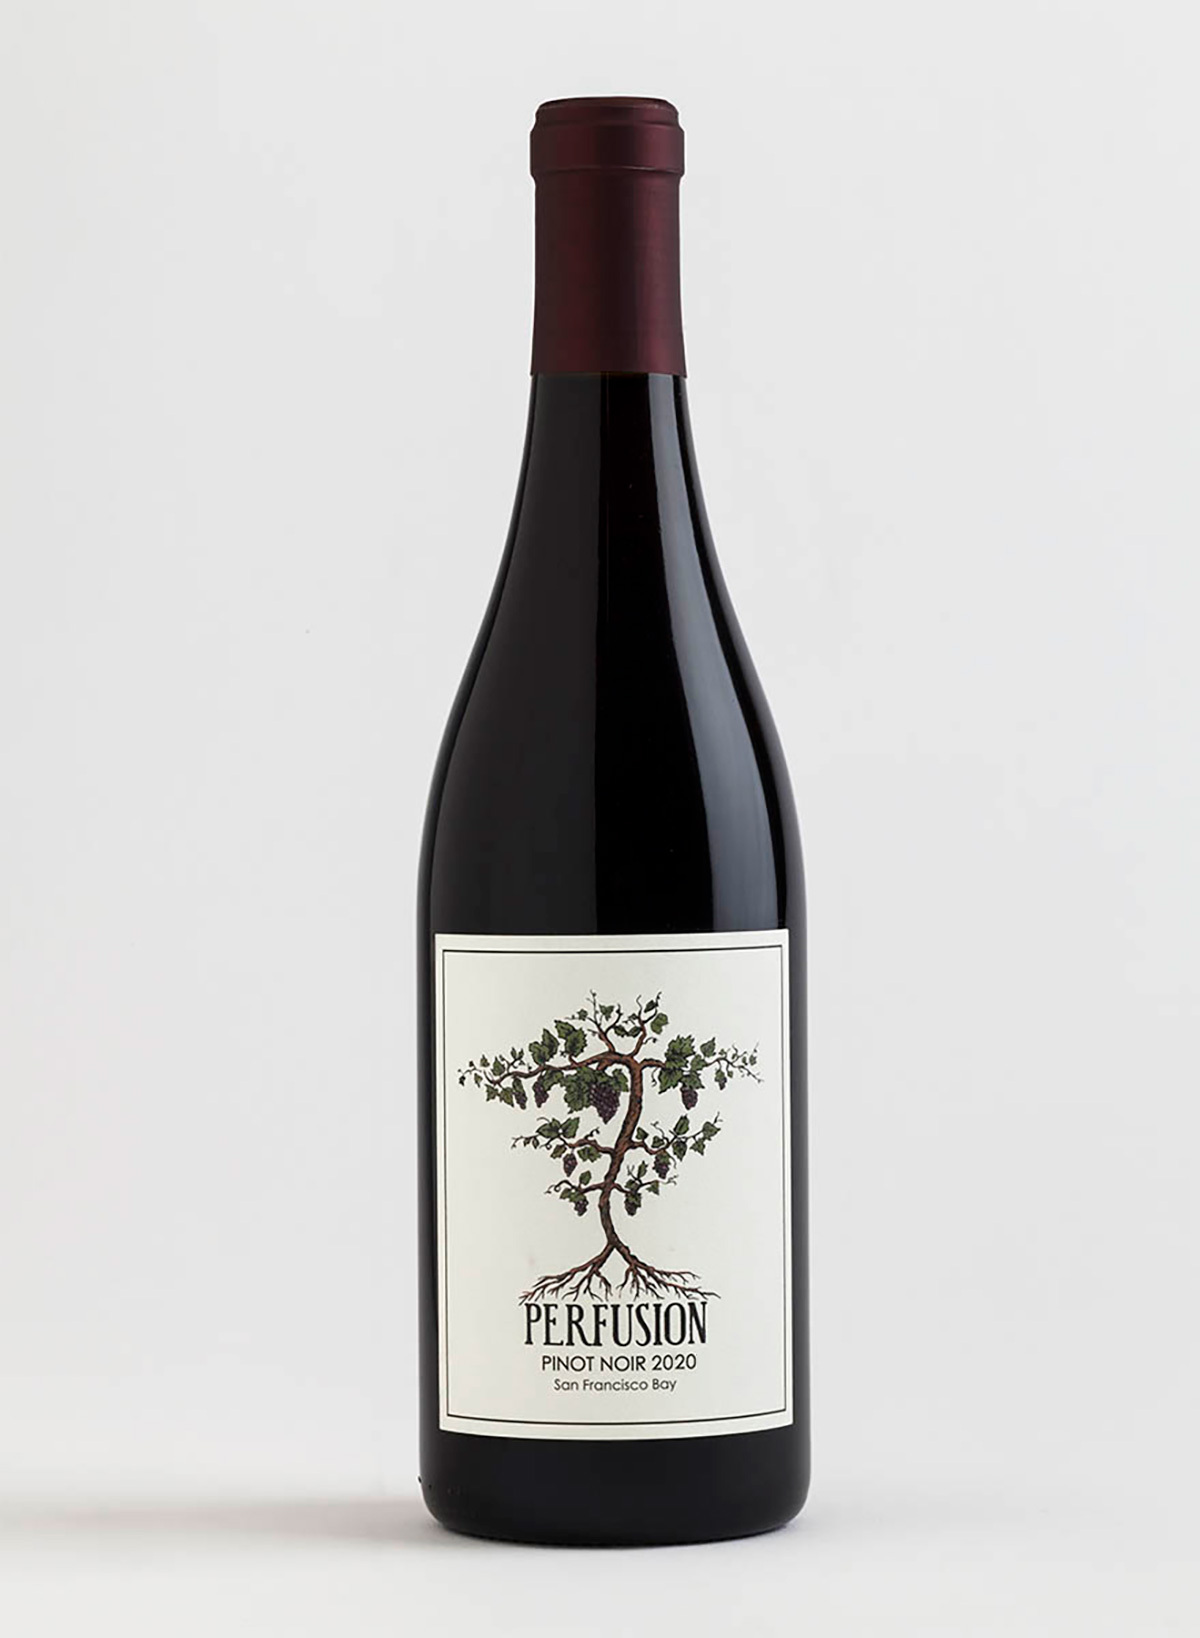 2020 Perfusion Vineyard Pinot Noir 00012